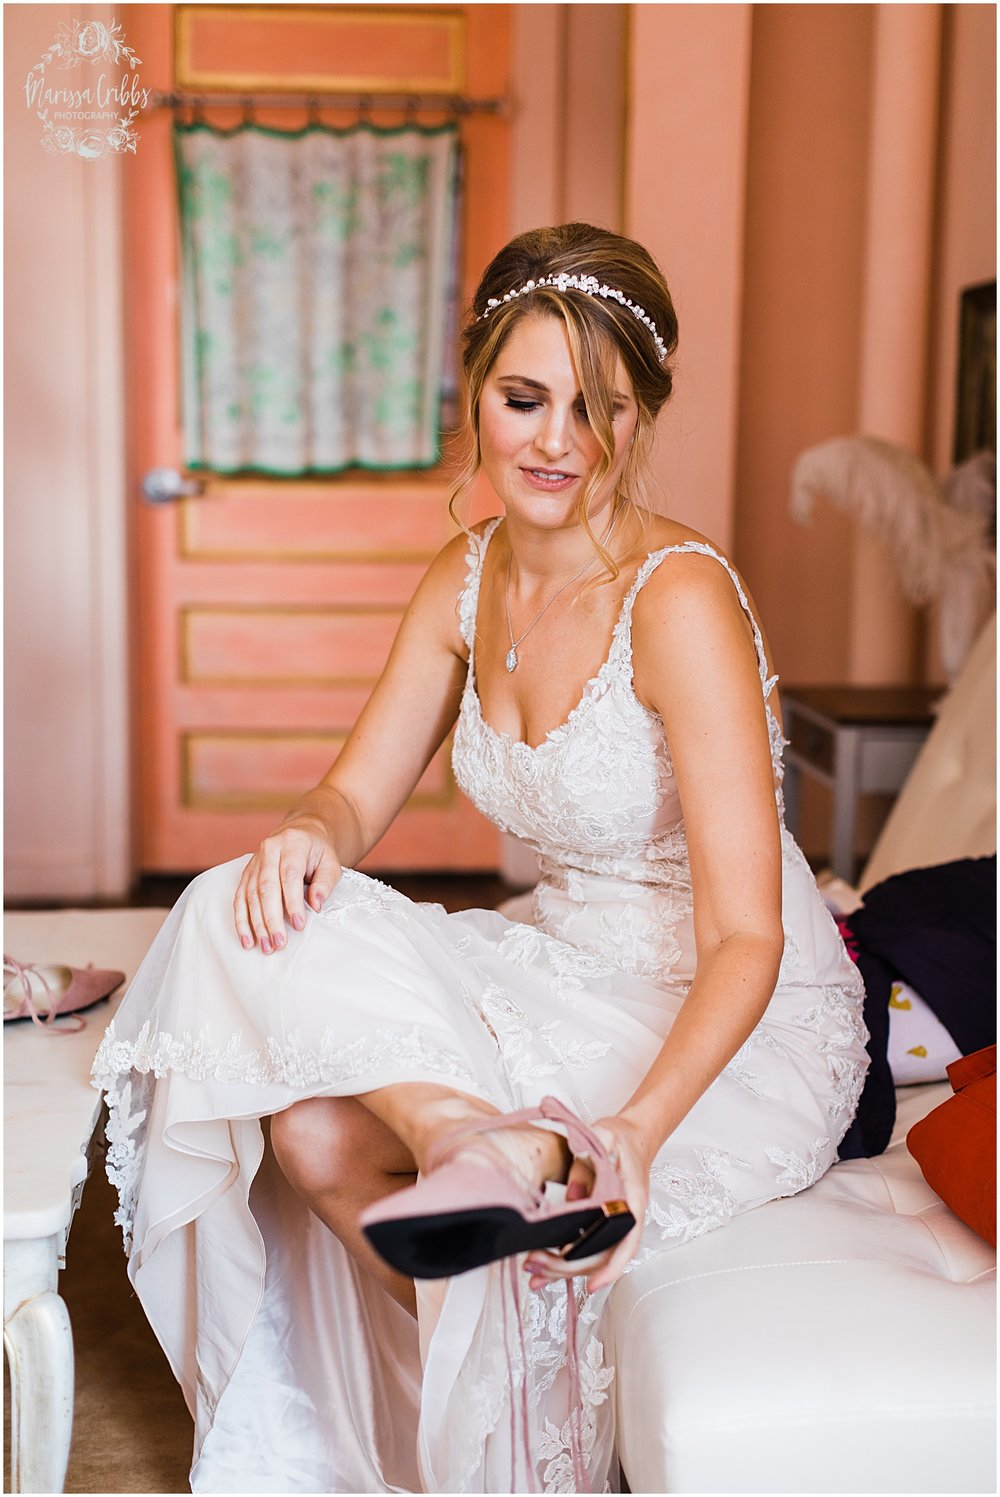 BAUER WEDDING | KELSEA & JUSTIN | MARISSA CRIBBS PHOTOGRAPHY_6499.jpg